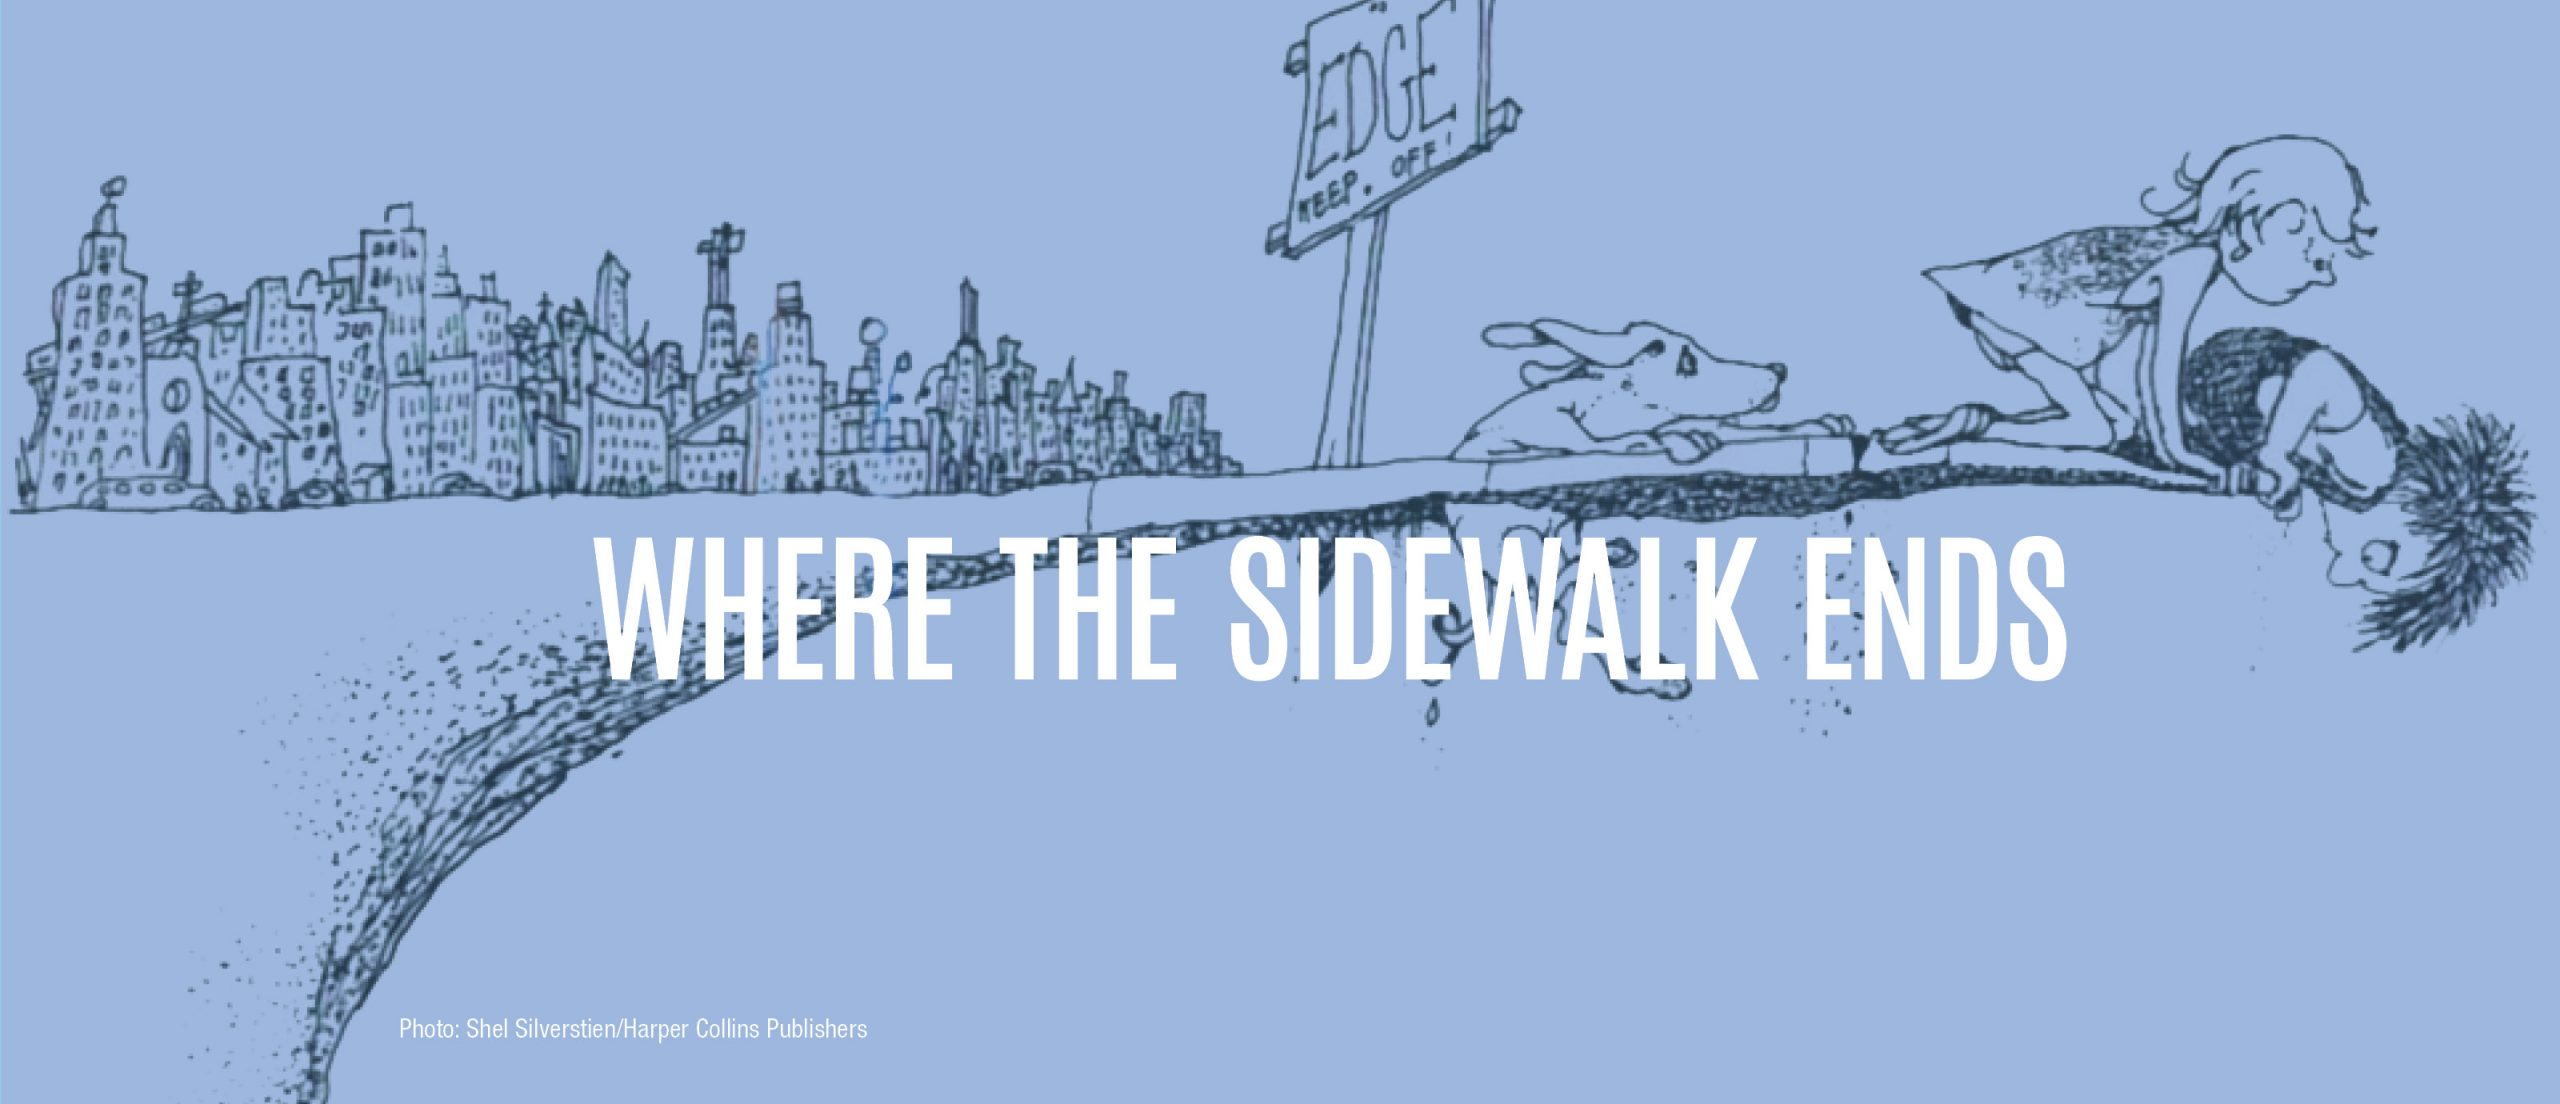 Blog title - Where the sidewalk ends